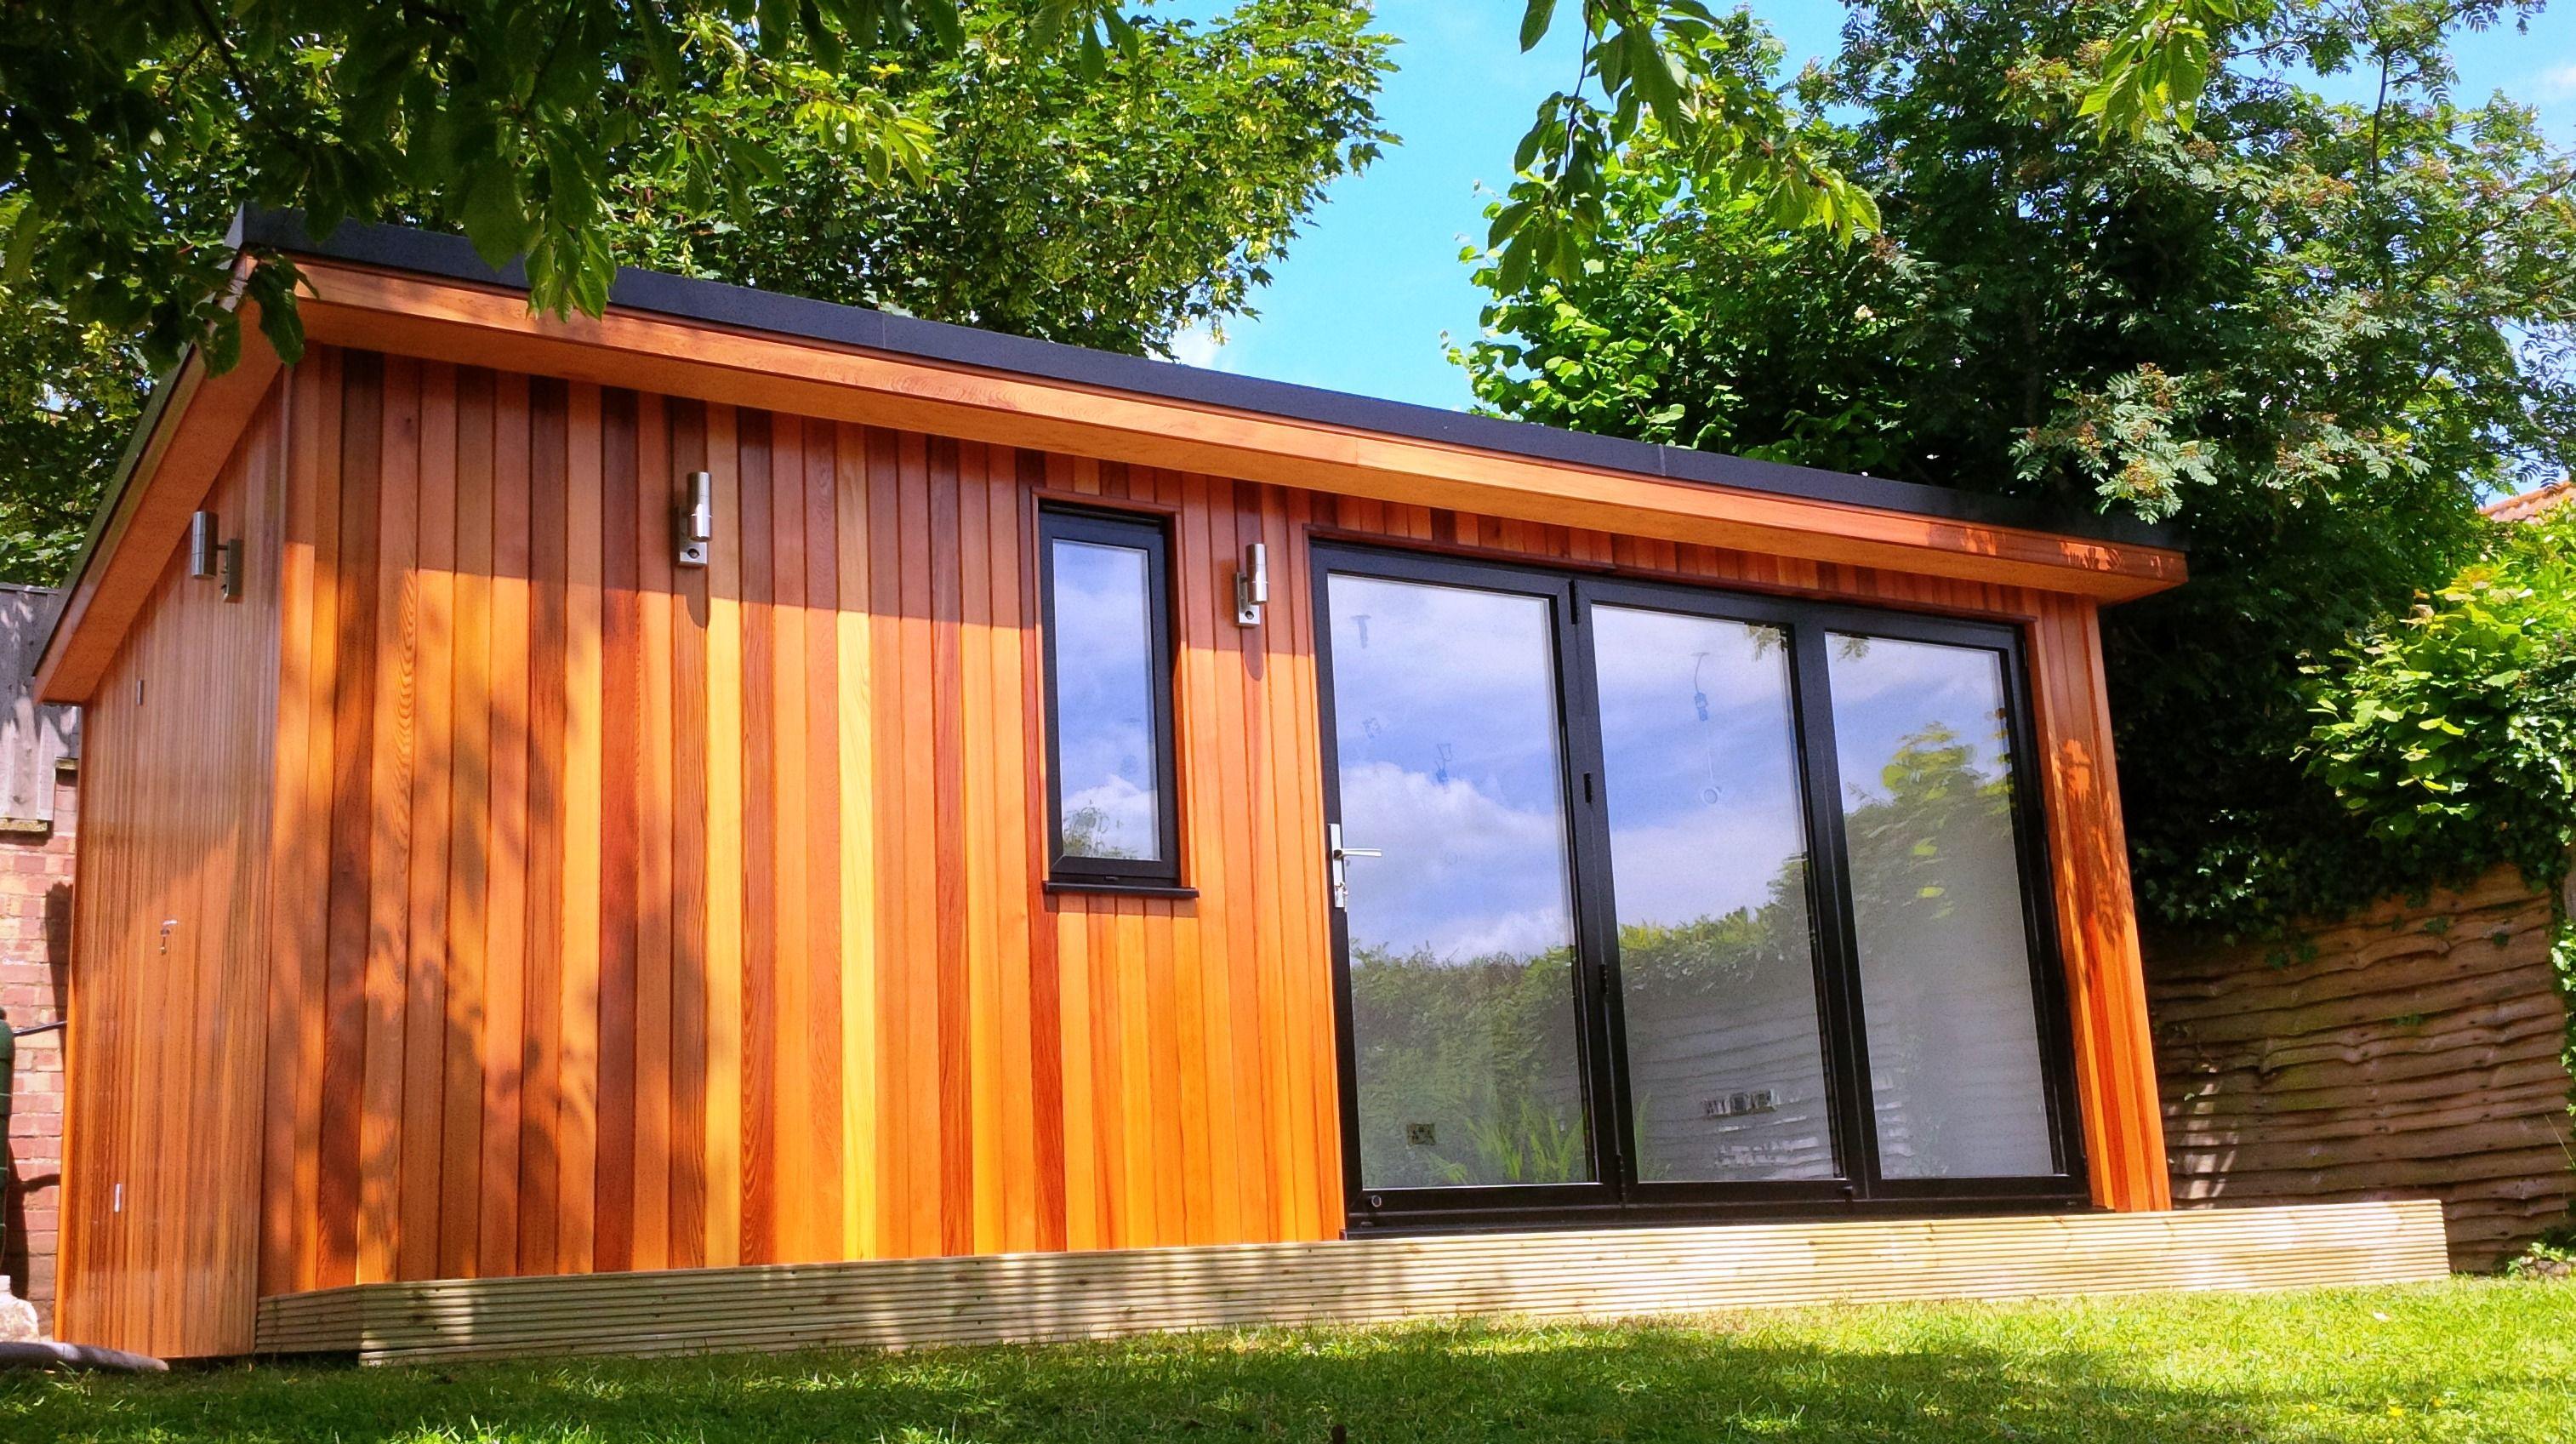 Garden room using western red cedar no 2 clear better for Sips garden buildings